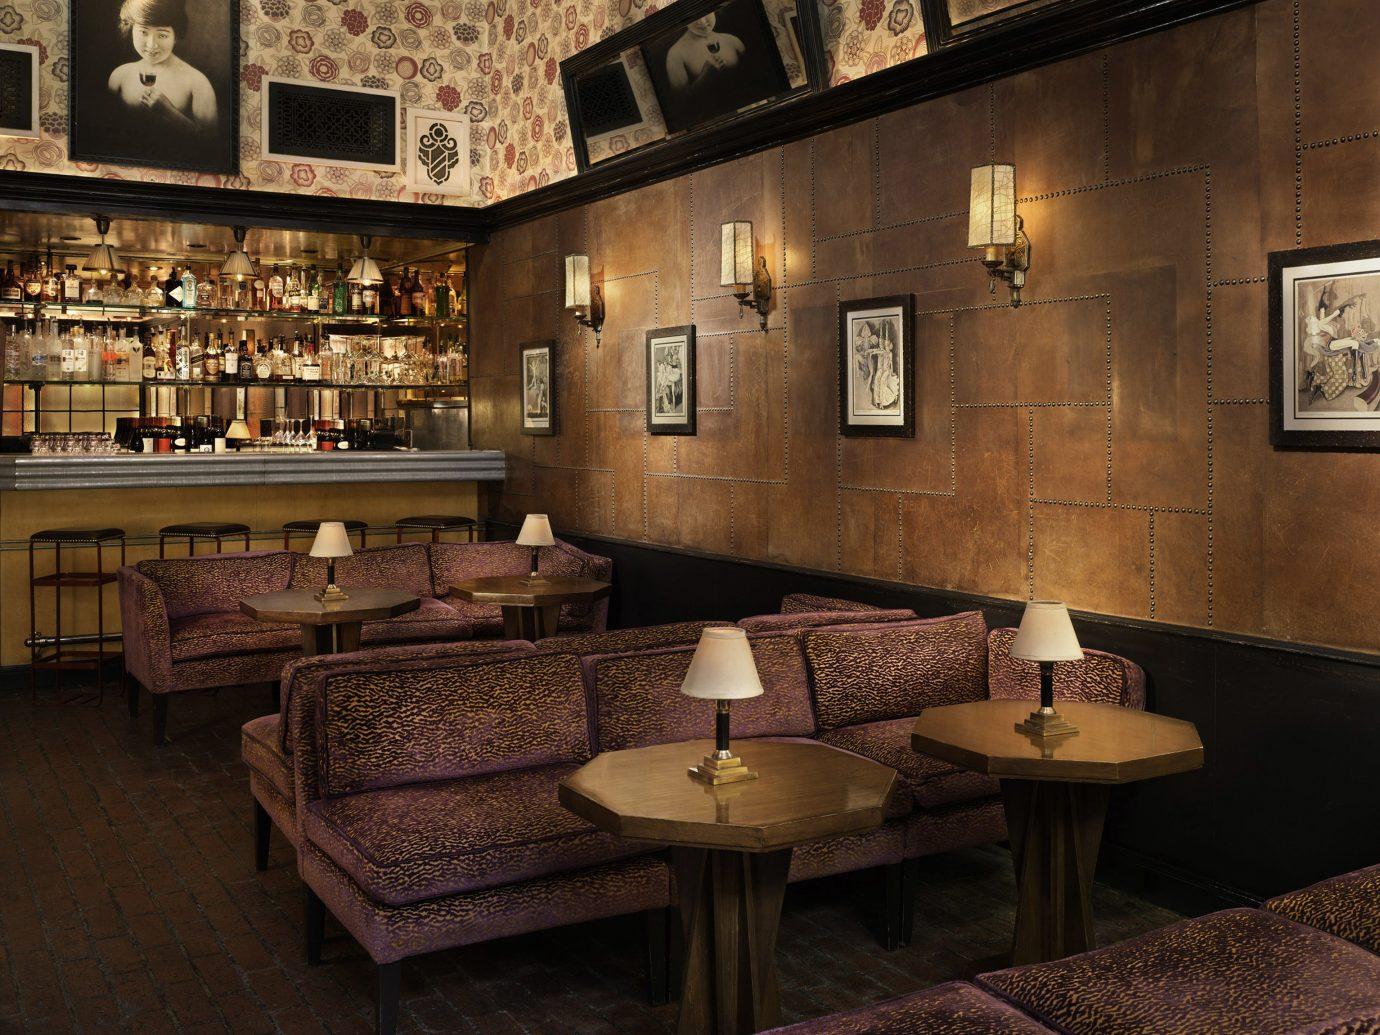 Celebs Hotels Offbeat Trip Ideas floor indoor room Bar estate interior design restaurant furniture